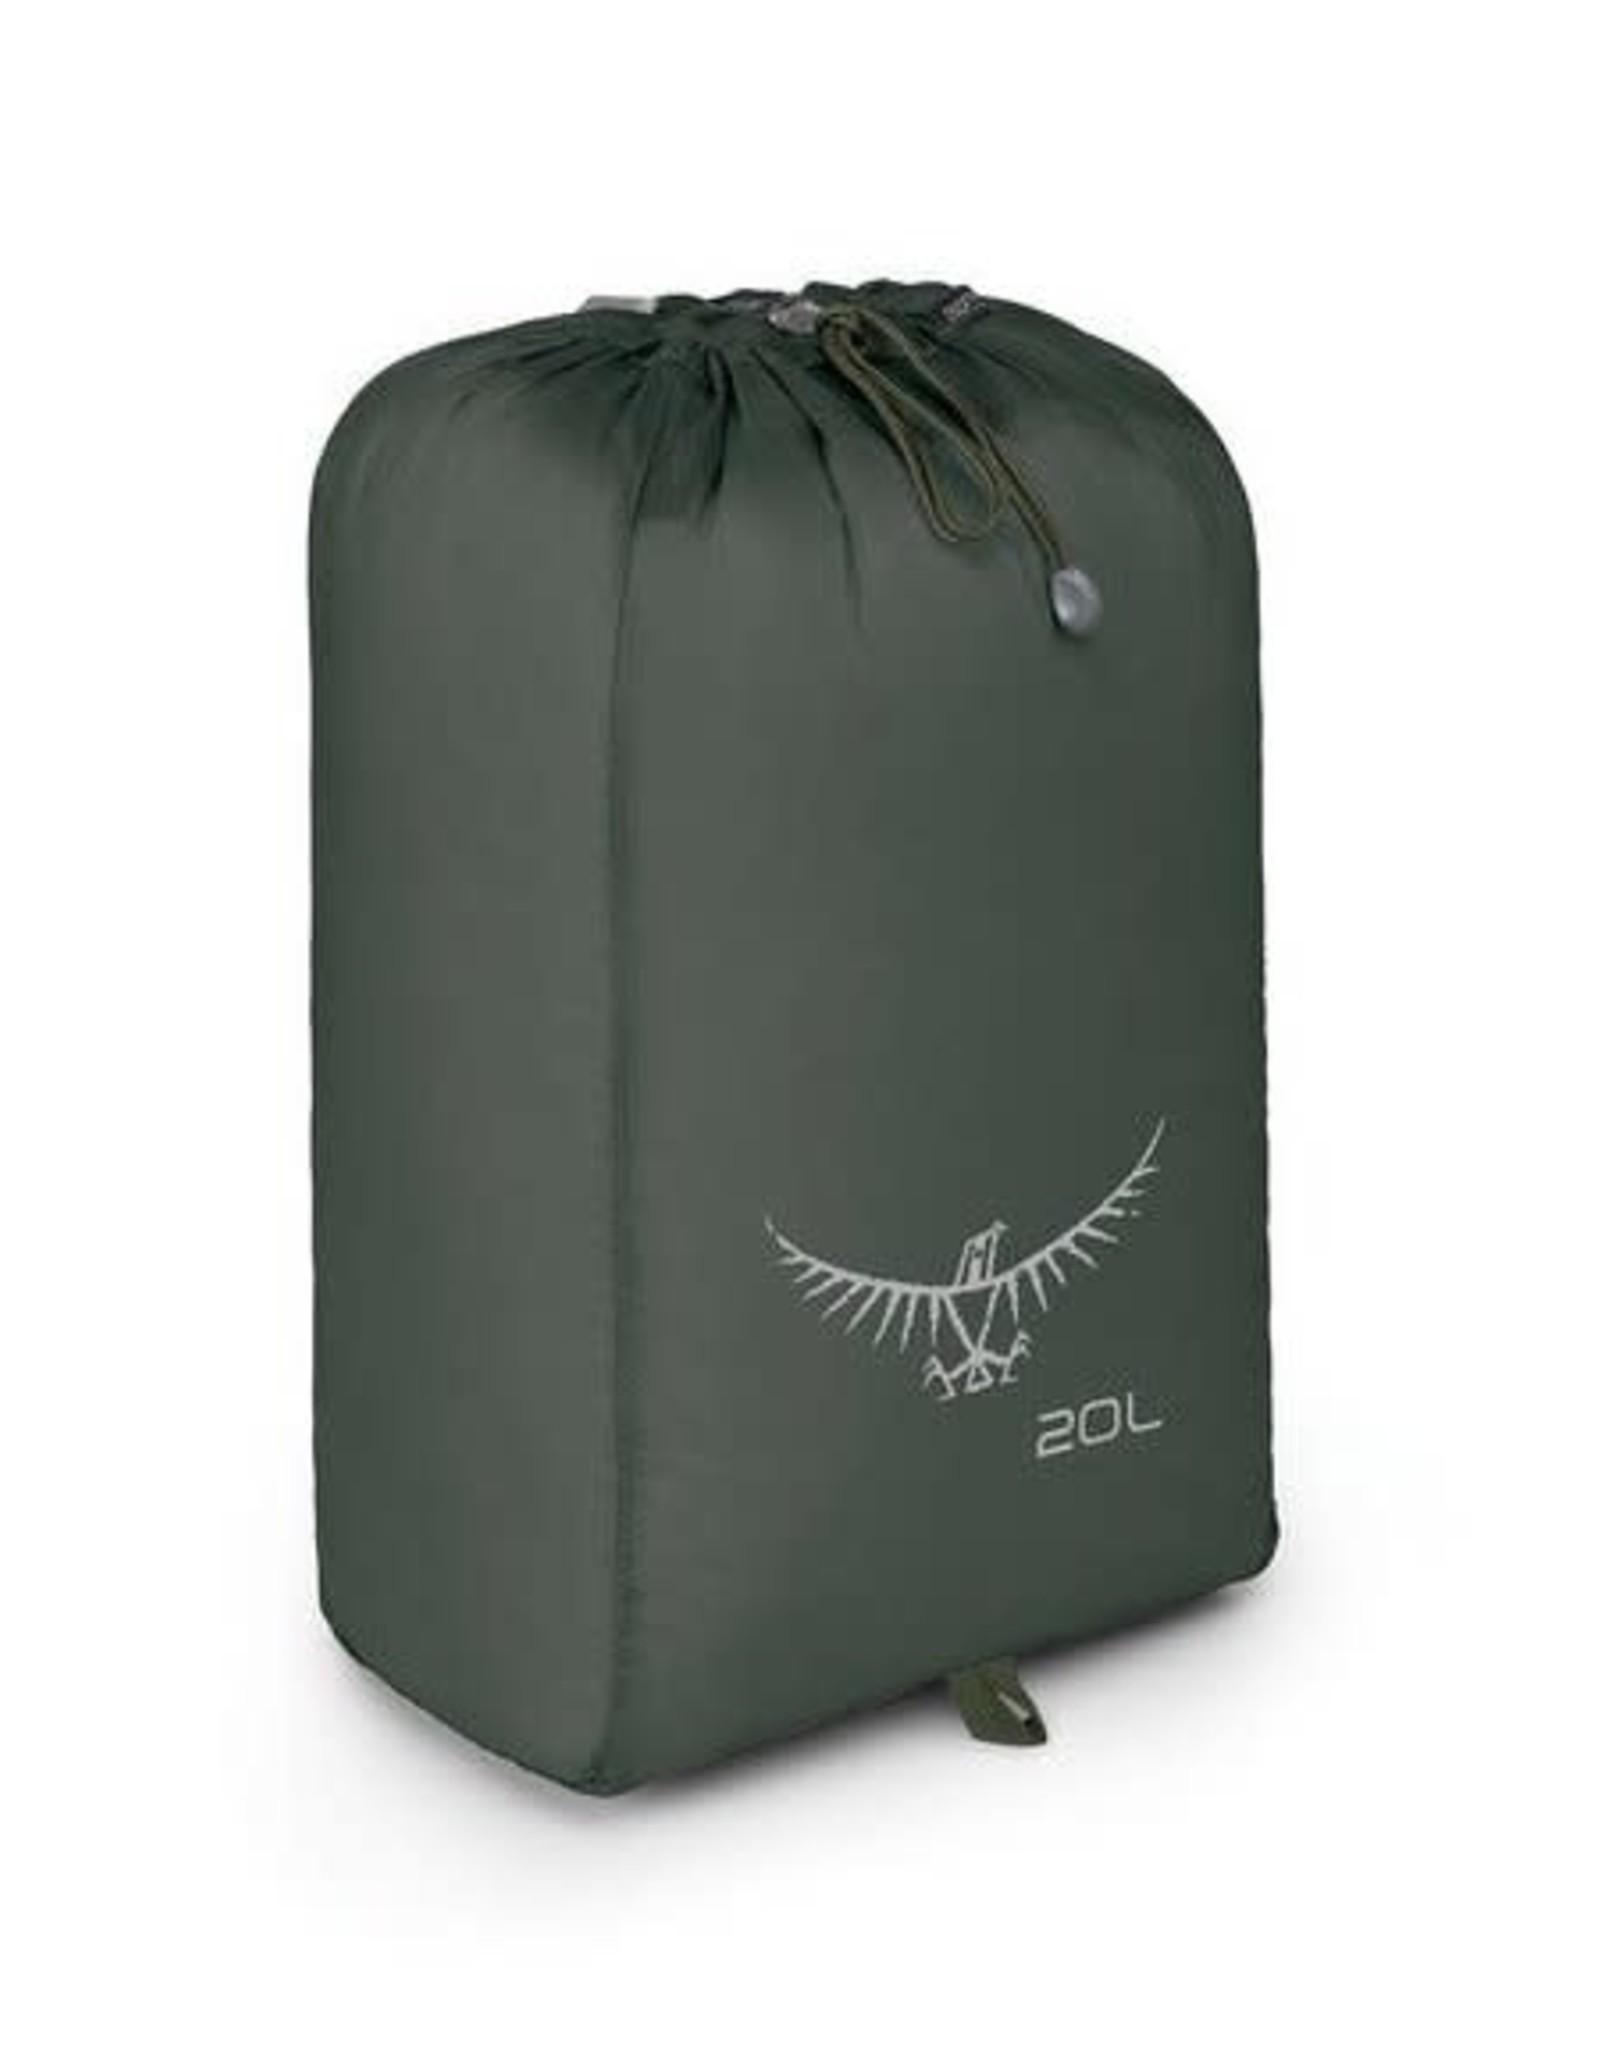 Osprey UL Stuff Sack 20L